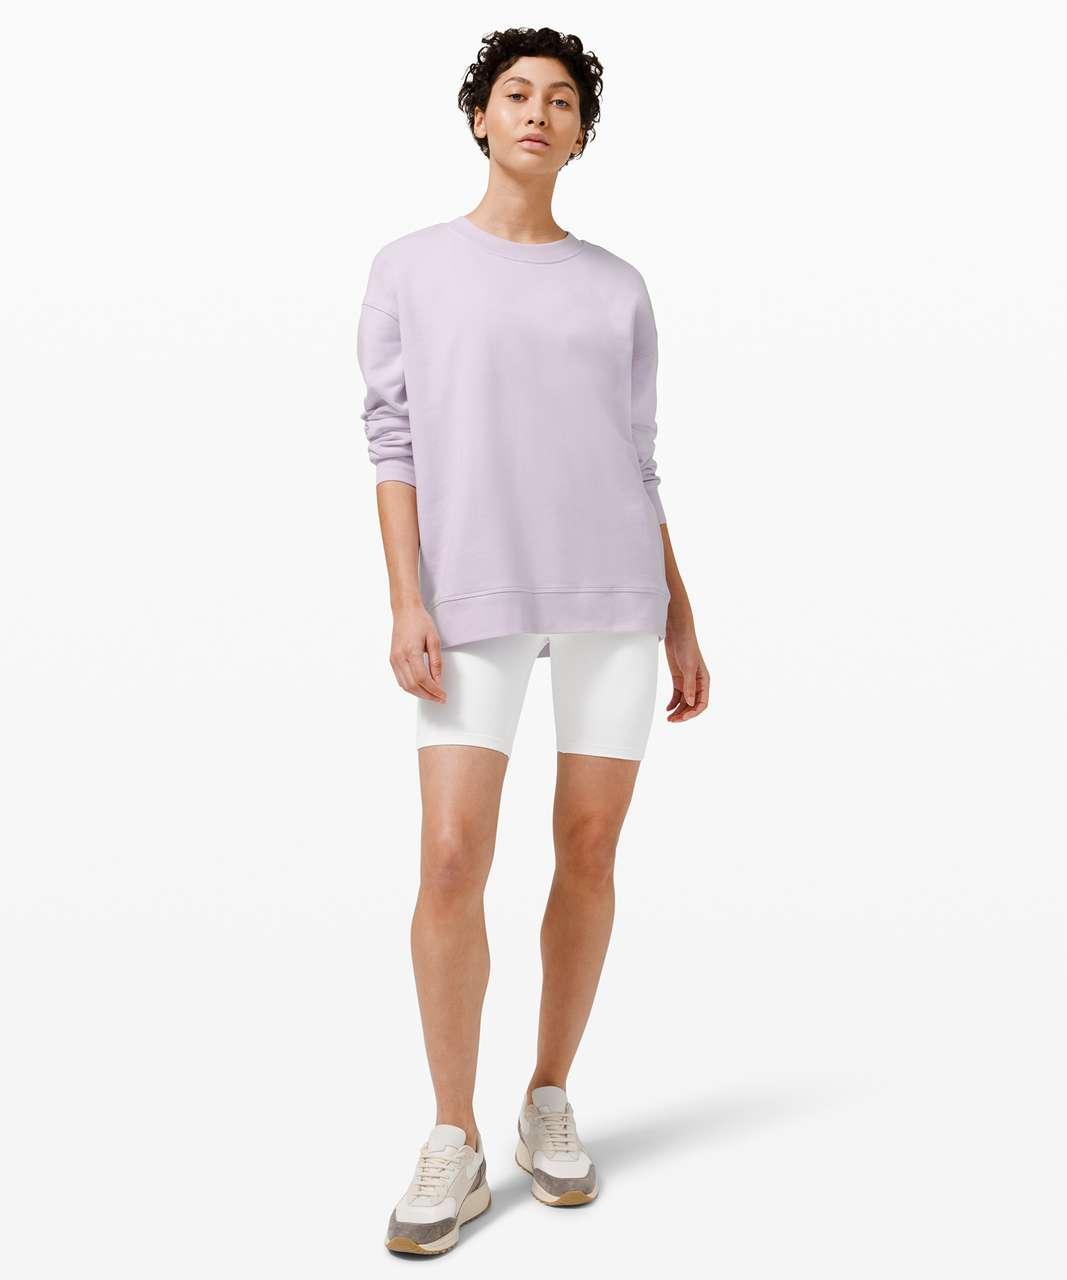 Lululemon Perfectly Oversized Crew - Lavender Dew